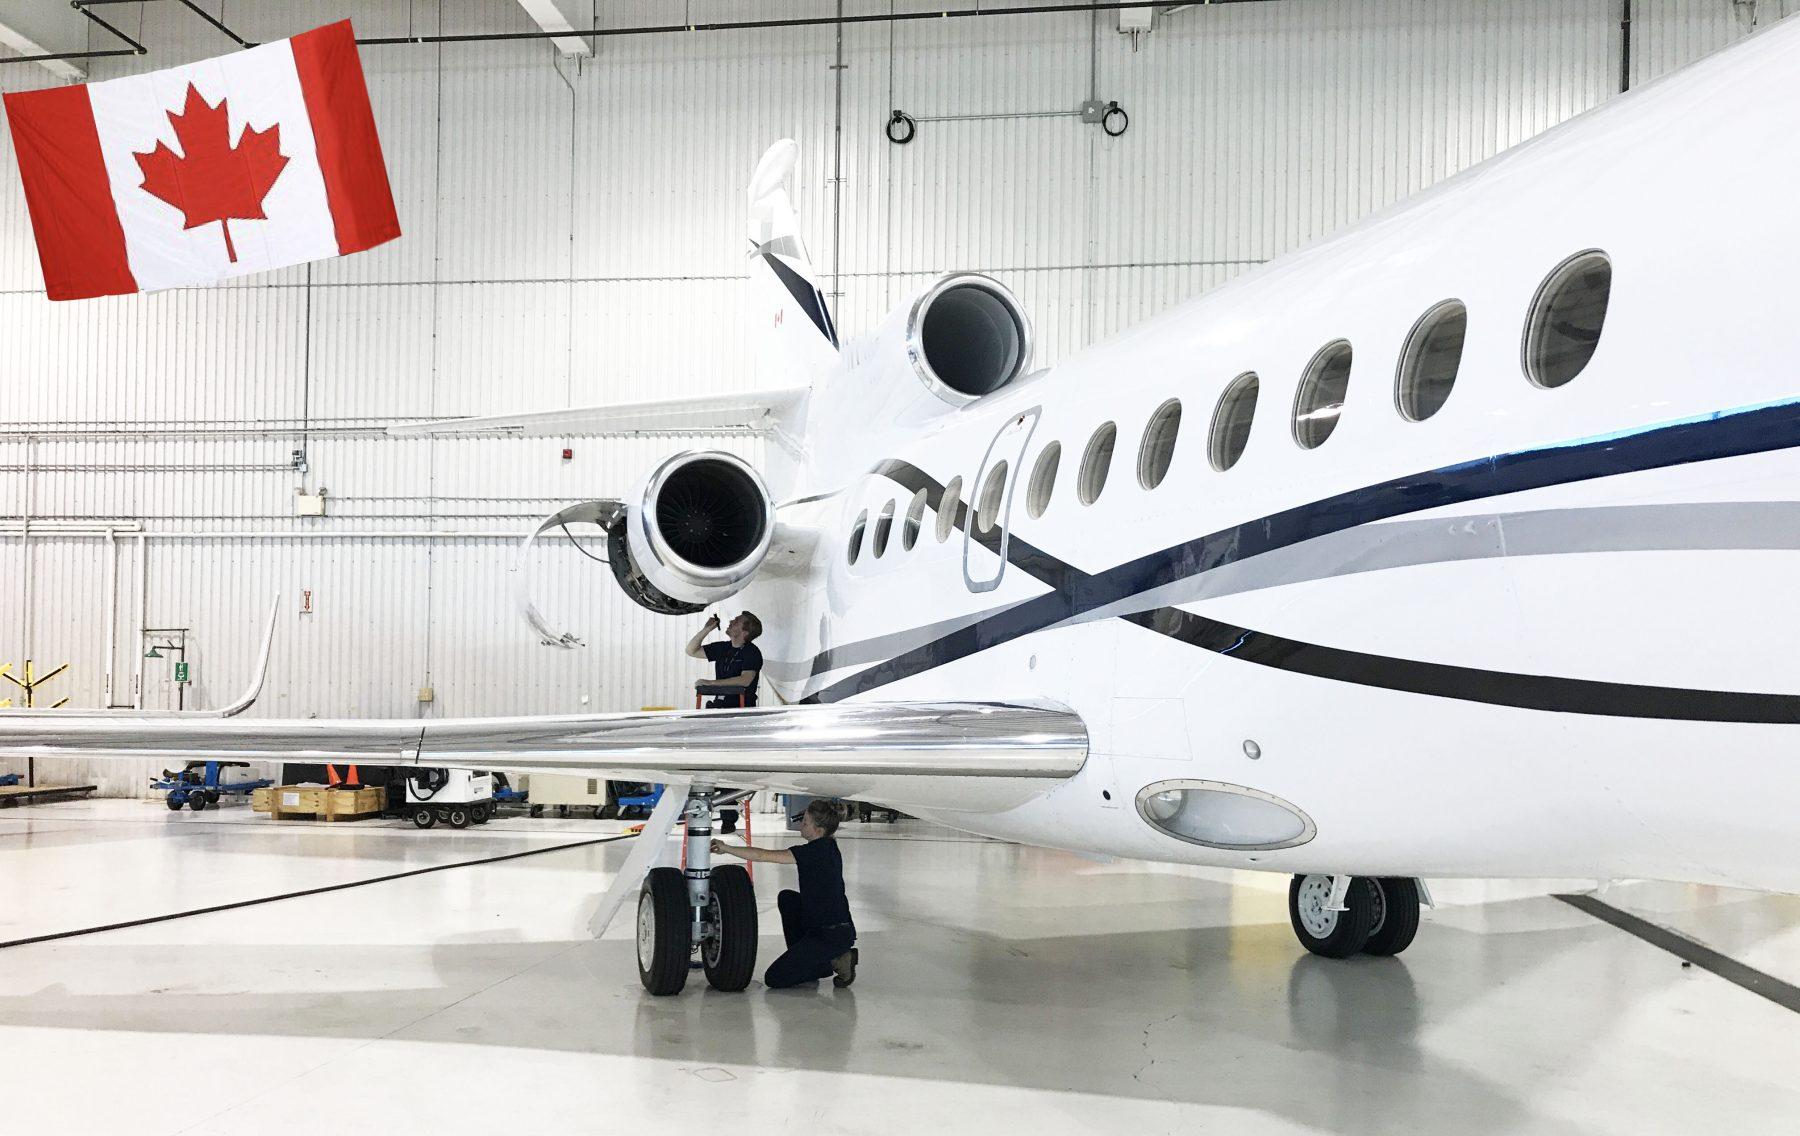 Dassault Falcon in hangar